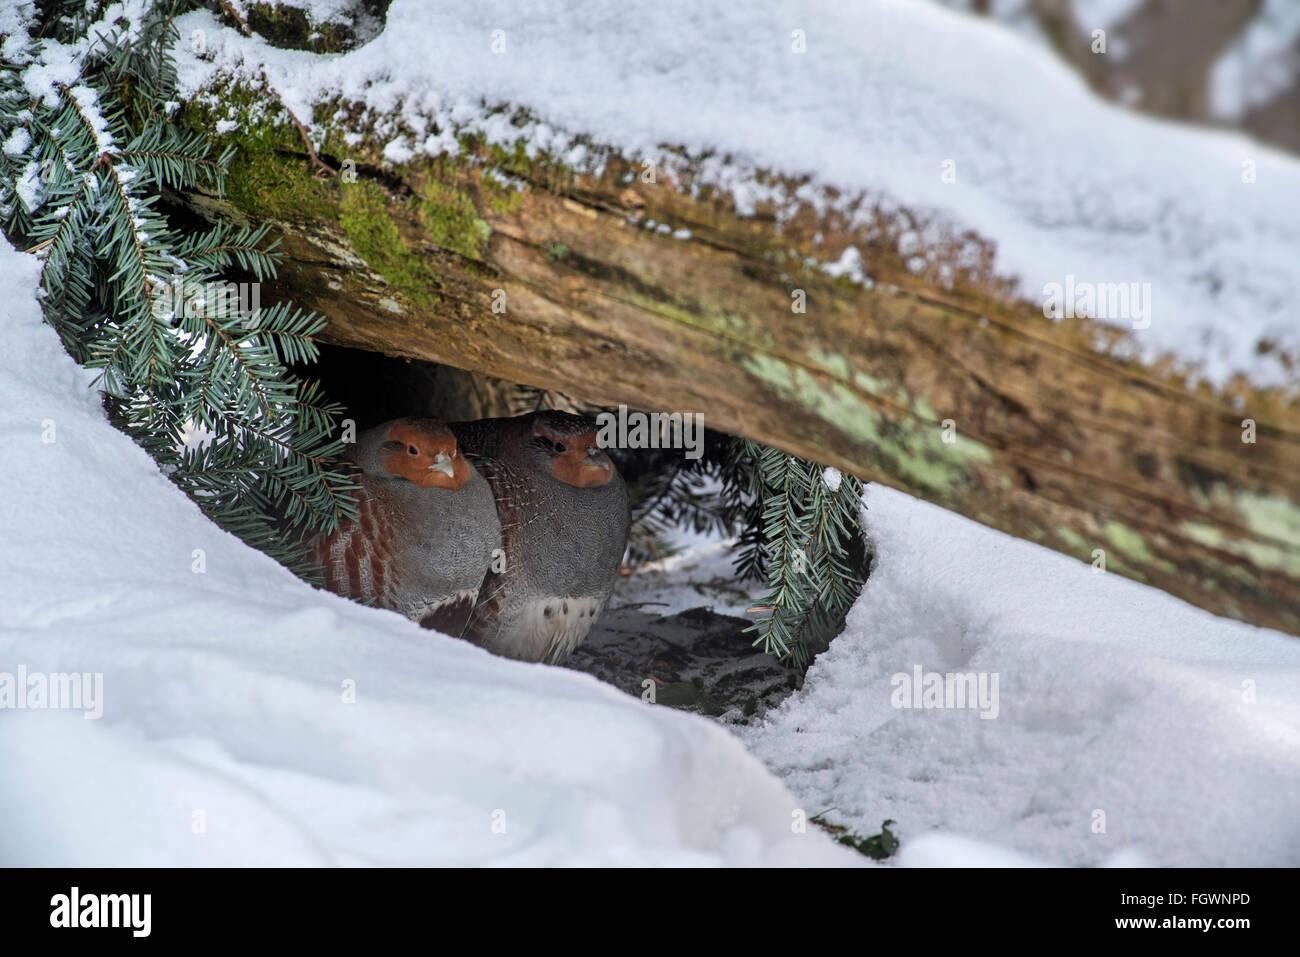 Grey partridges / English partridge (Perdix perdix) couple seeking shelter under log in the snow in winter during - Stock Image